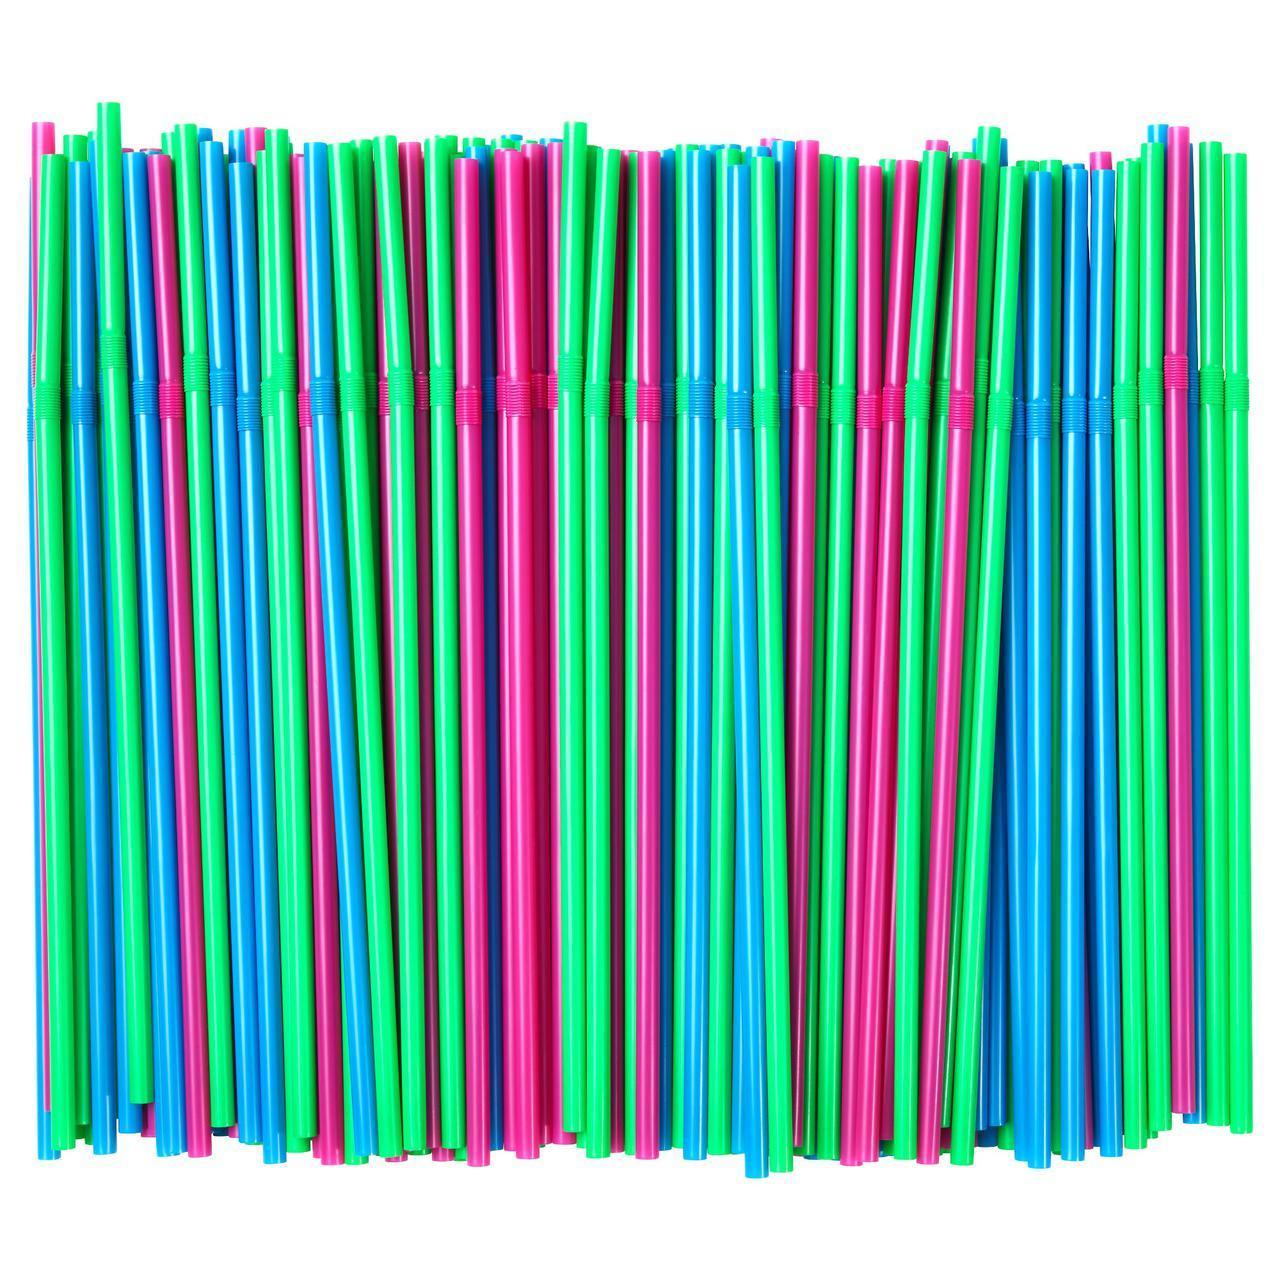 IKEA SODA (503.545.98) Трубочки, зеленый флуоресцентный, ярко-синий/ярко-розовый